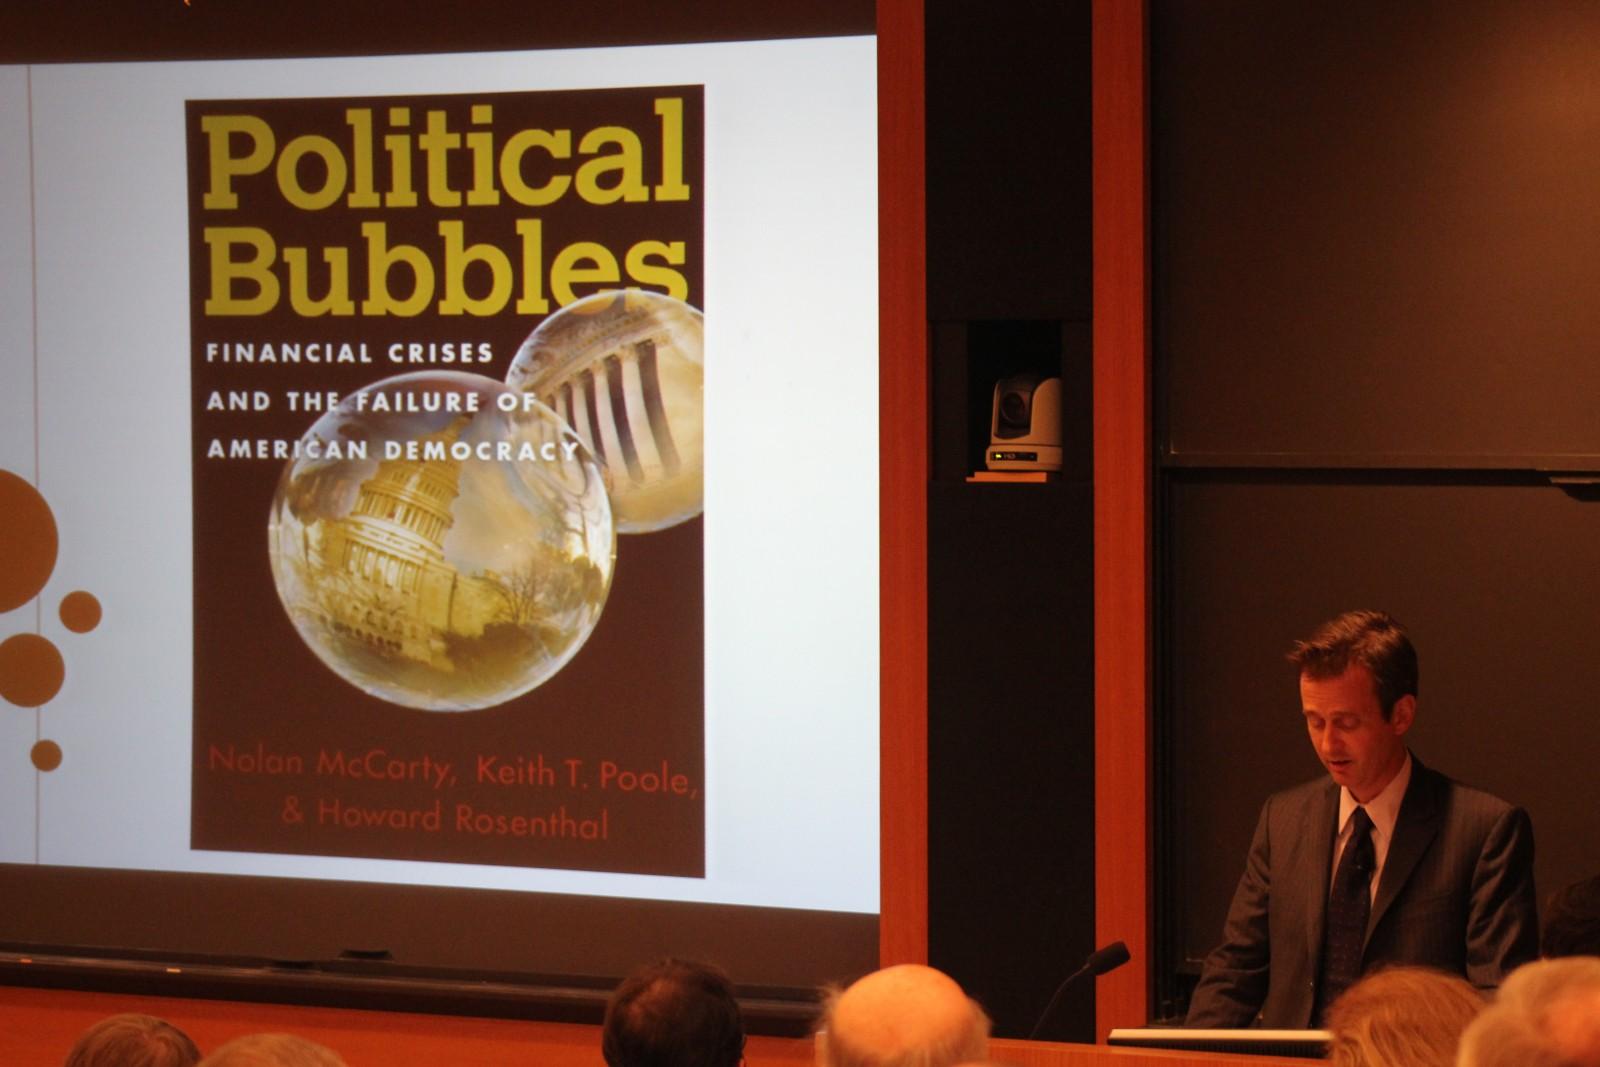 McCarty_Political Bubbles book talk_WWS